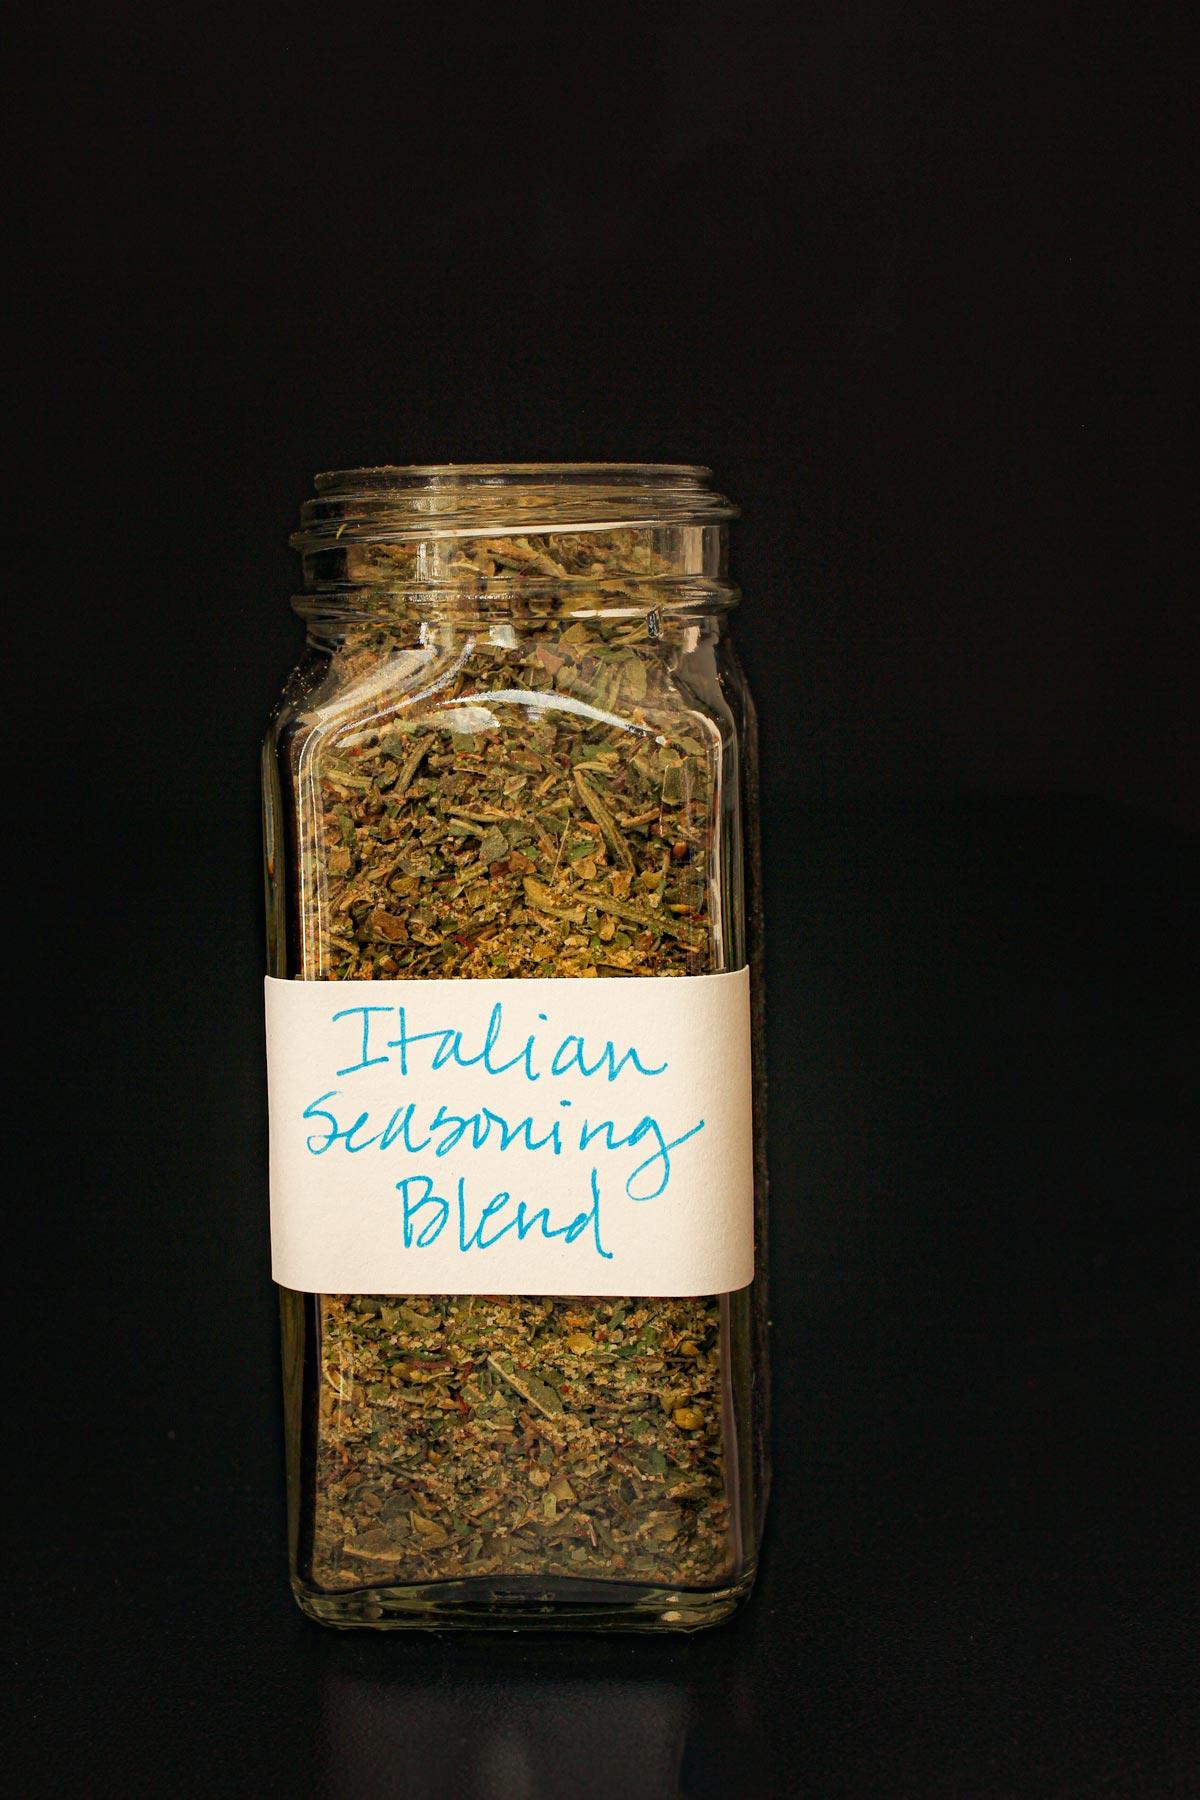 jar of homemade Italian seasoning with a hard-written label.